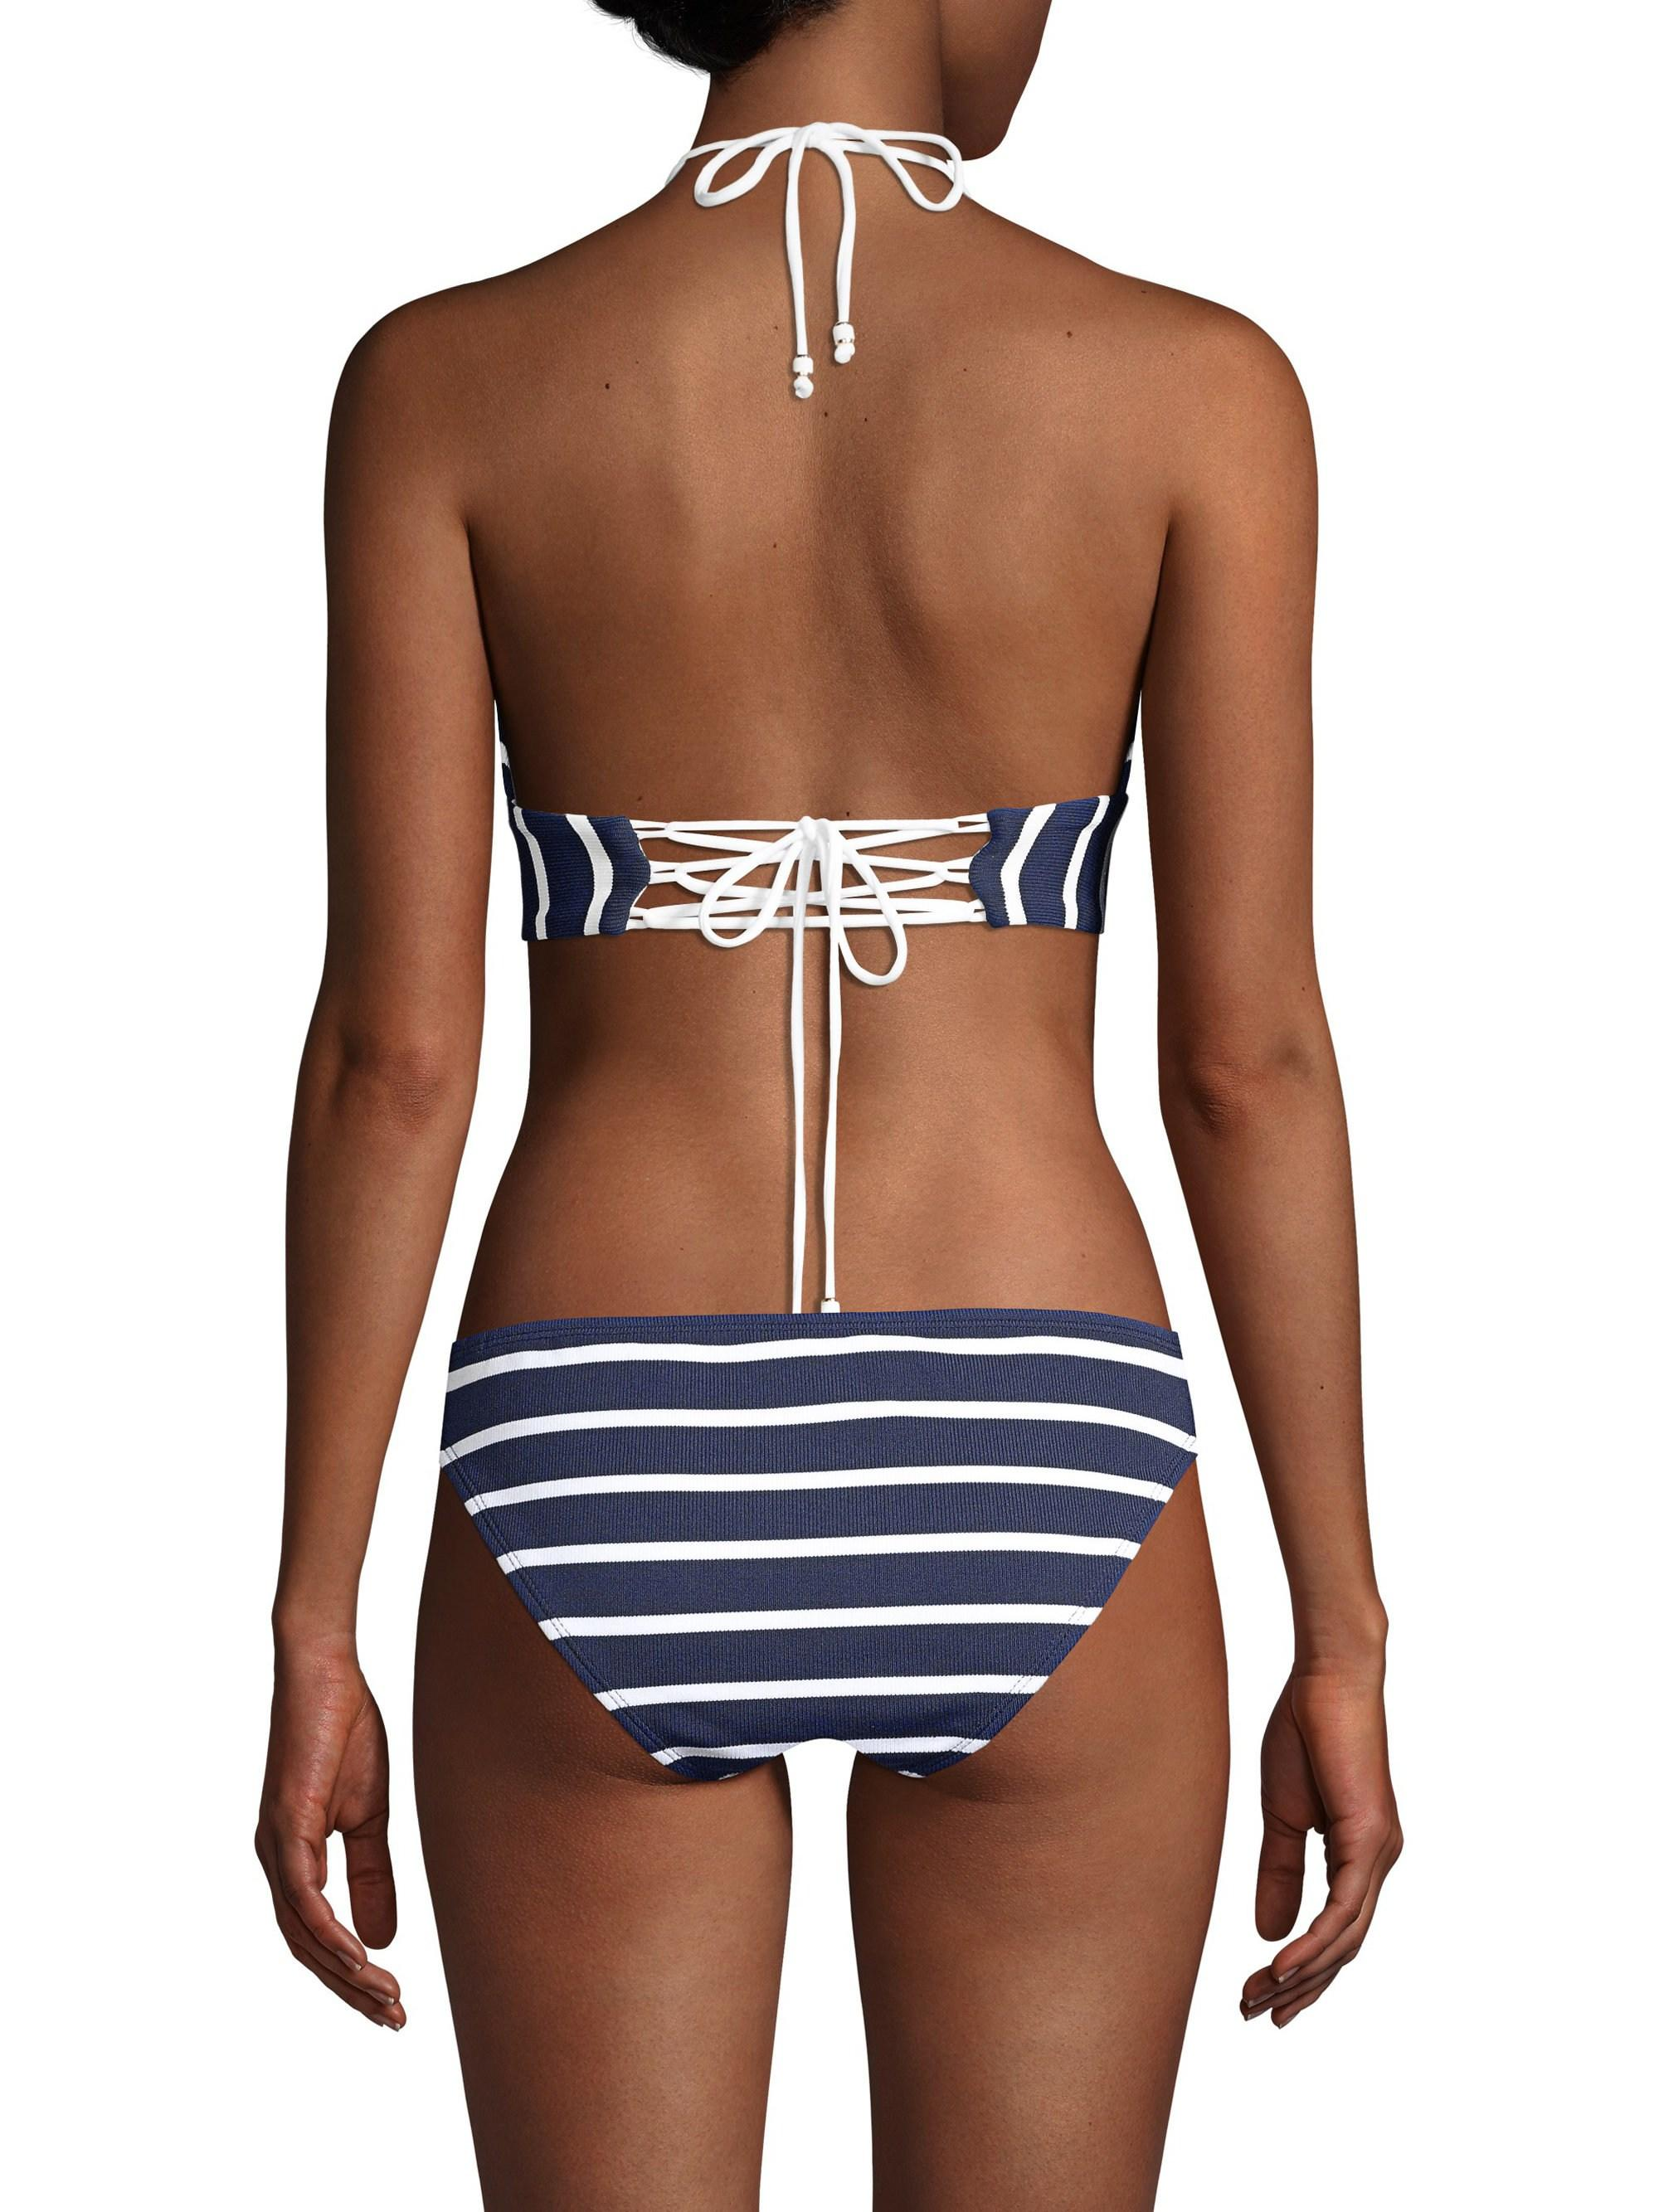 8c424ff88388a Shoshanna Women s Striped Bikini Top - Navy White - Size Ddd in Blue - Lyst